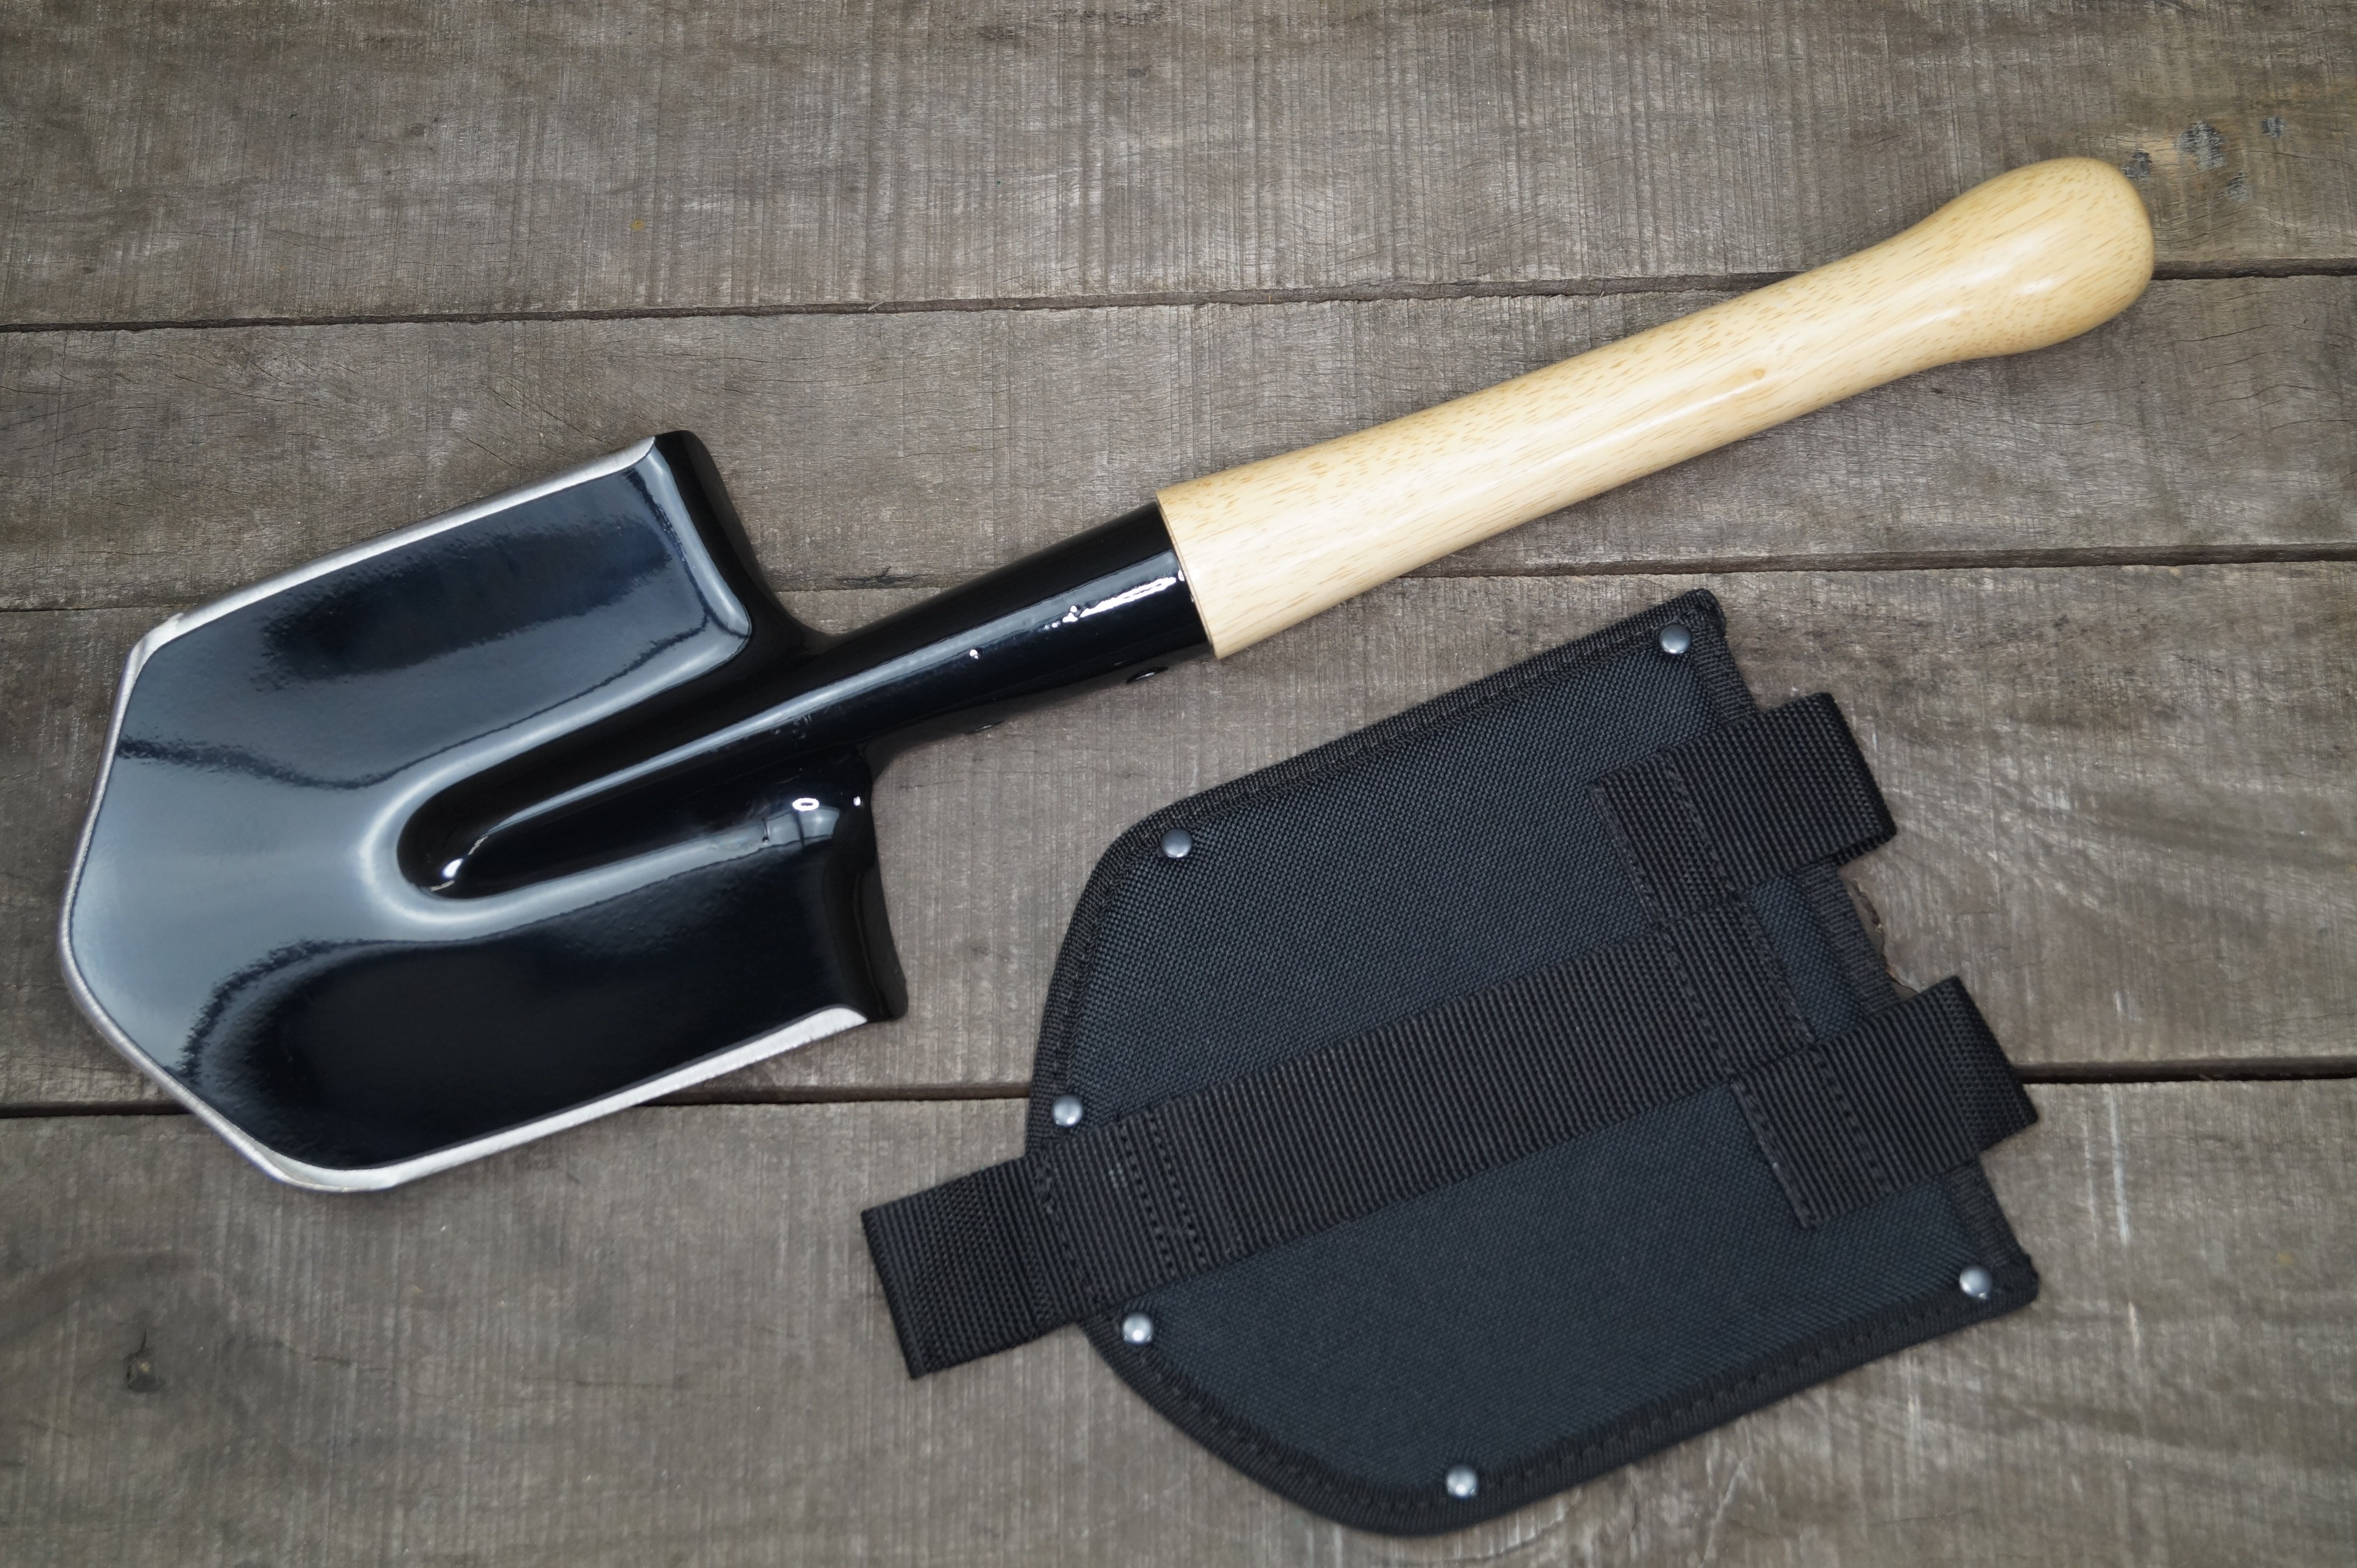 Cold Steel Special Forces Shovel mit Scheide